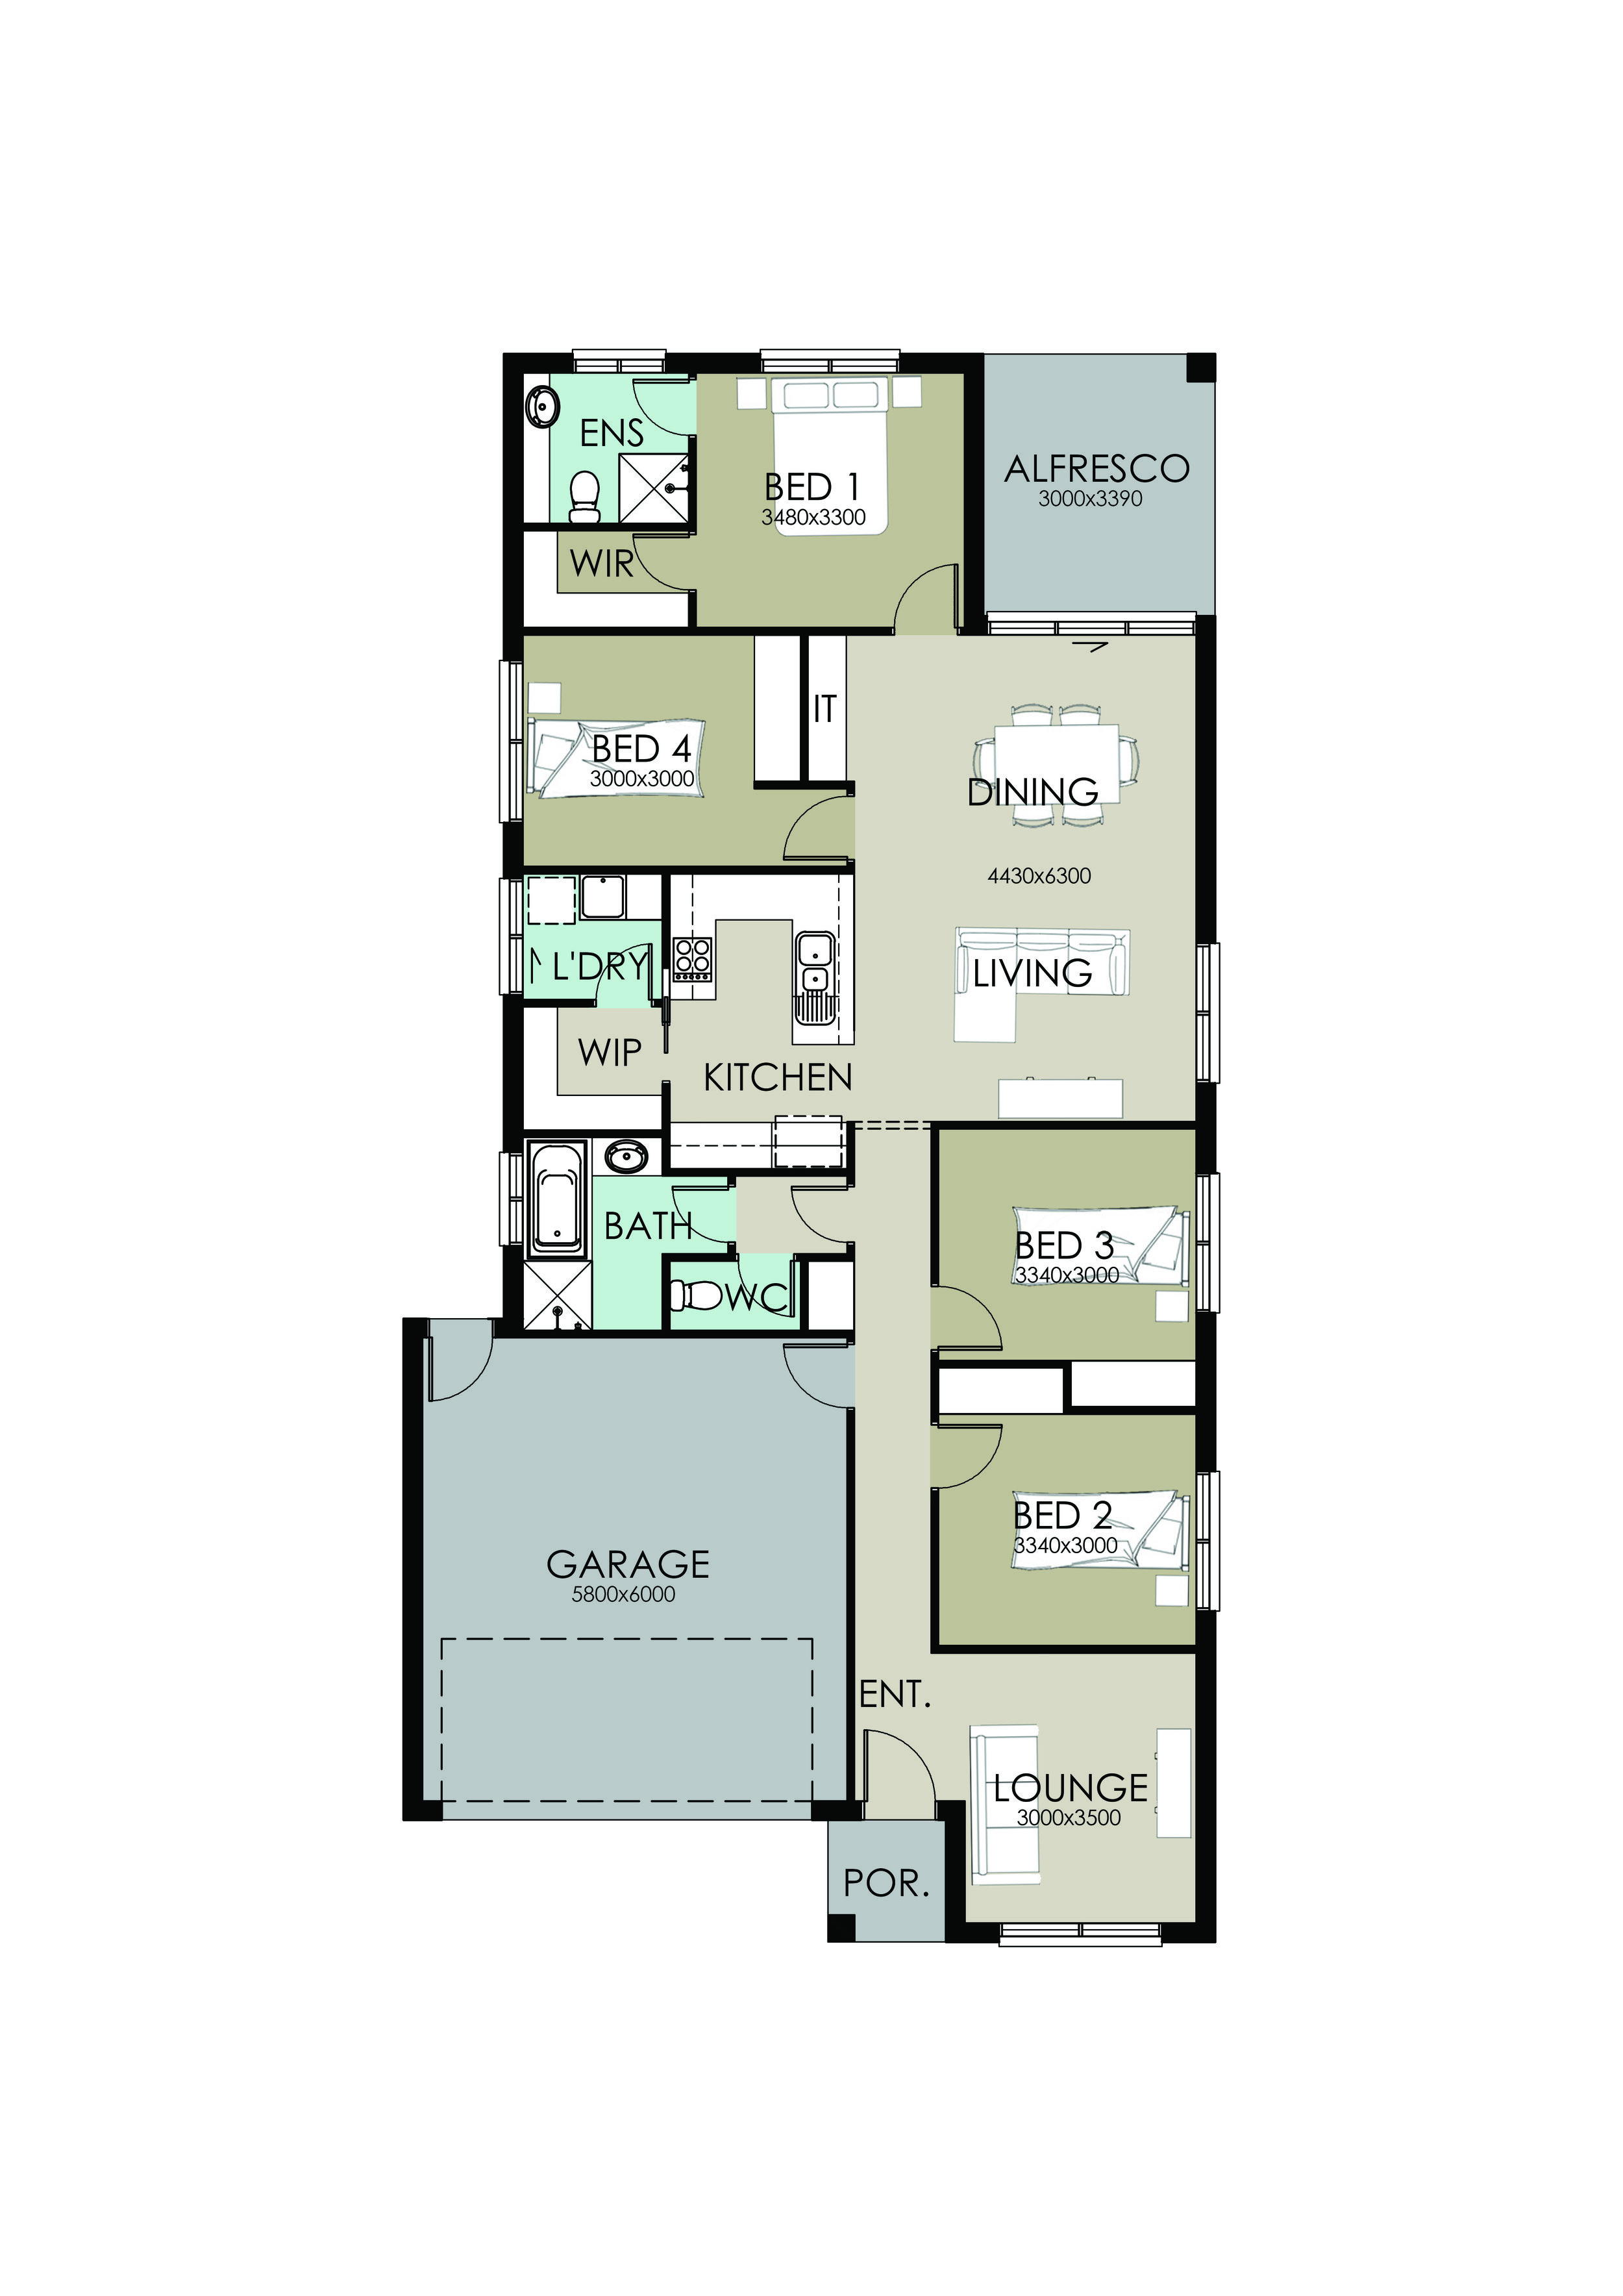 Alfresco 4 Bedroom Home Plans Richard Adams Homes